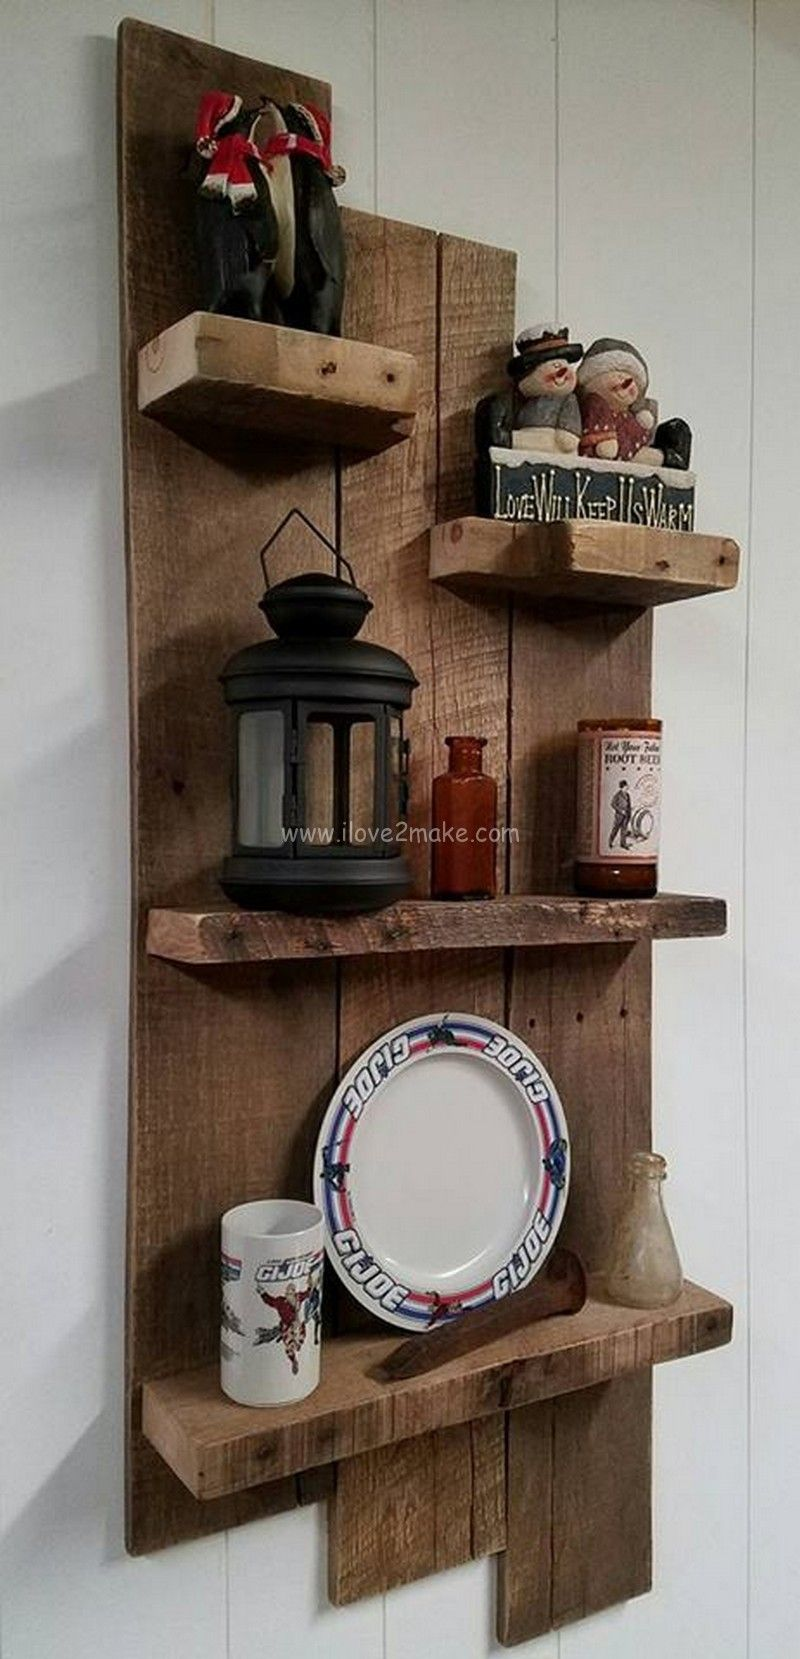 Pallet shelf design percheros for Deco en palet de madera